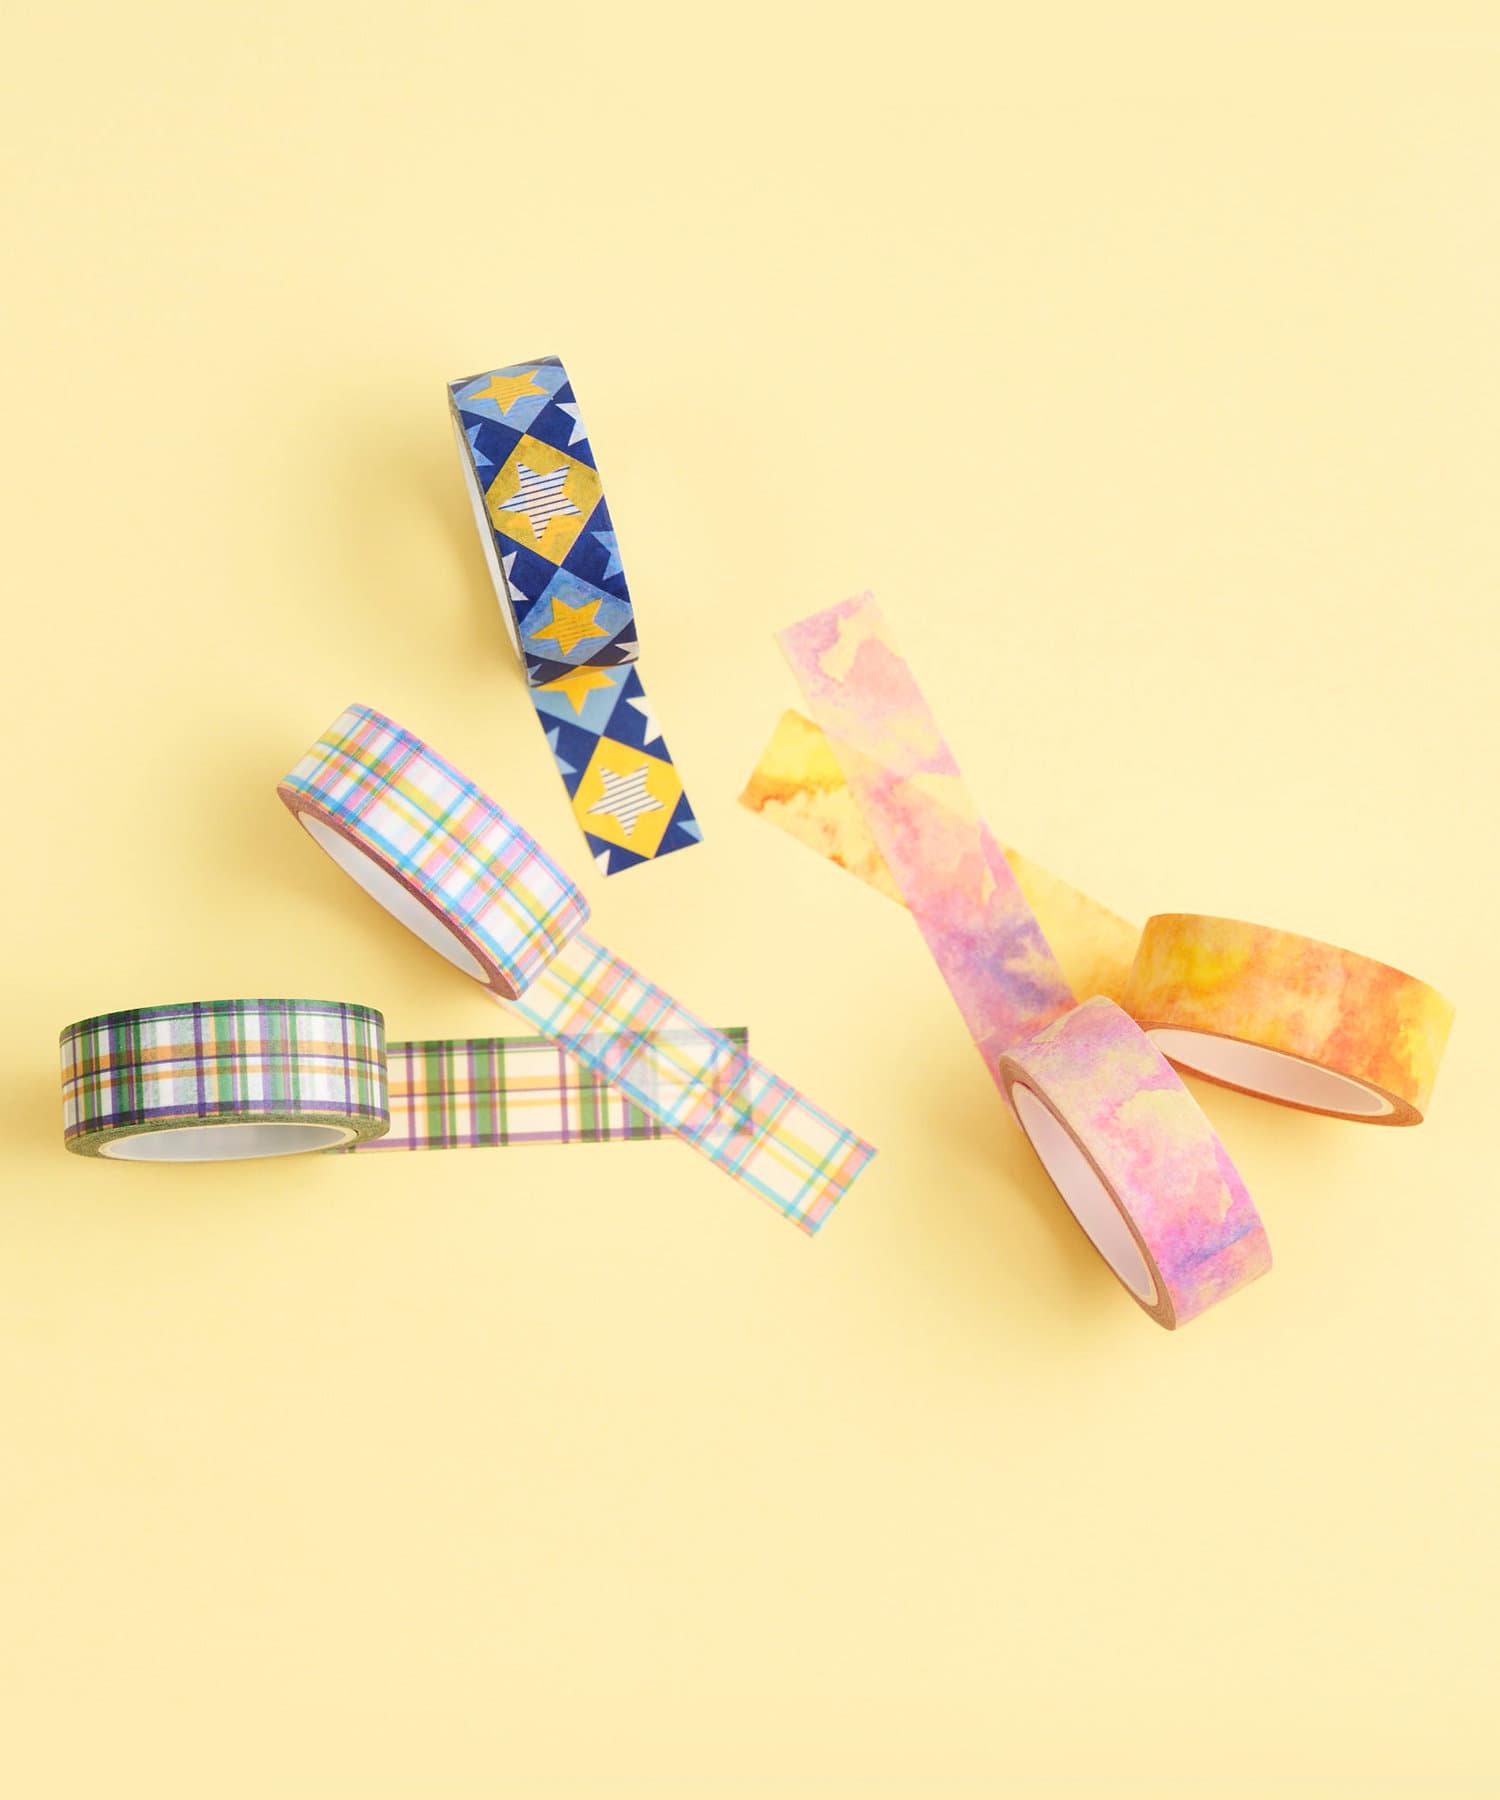 3COINS(スリーコインズ) 【ASOKO】【WEB限定セット】マスキングテープ5個セット